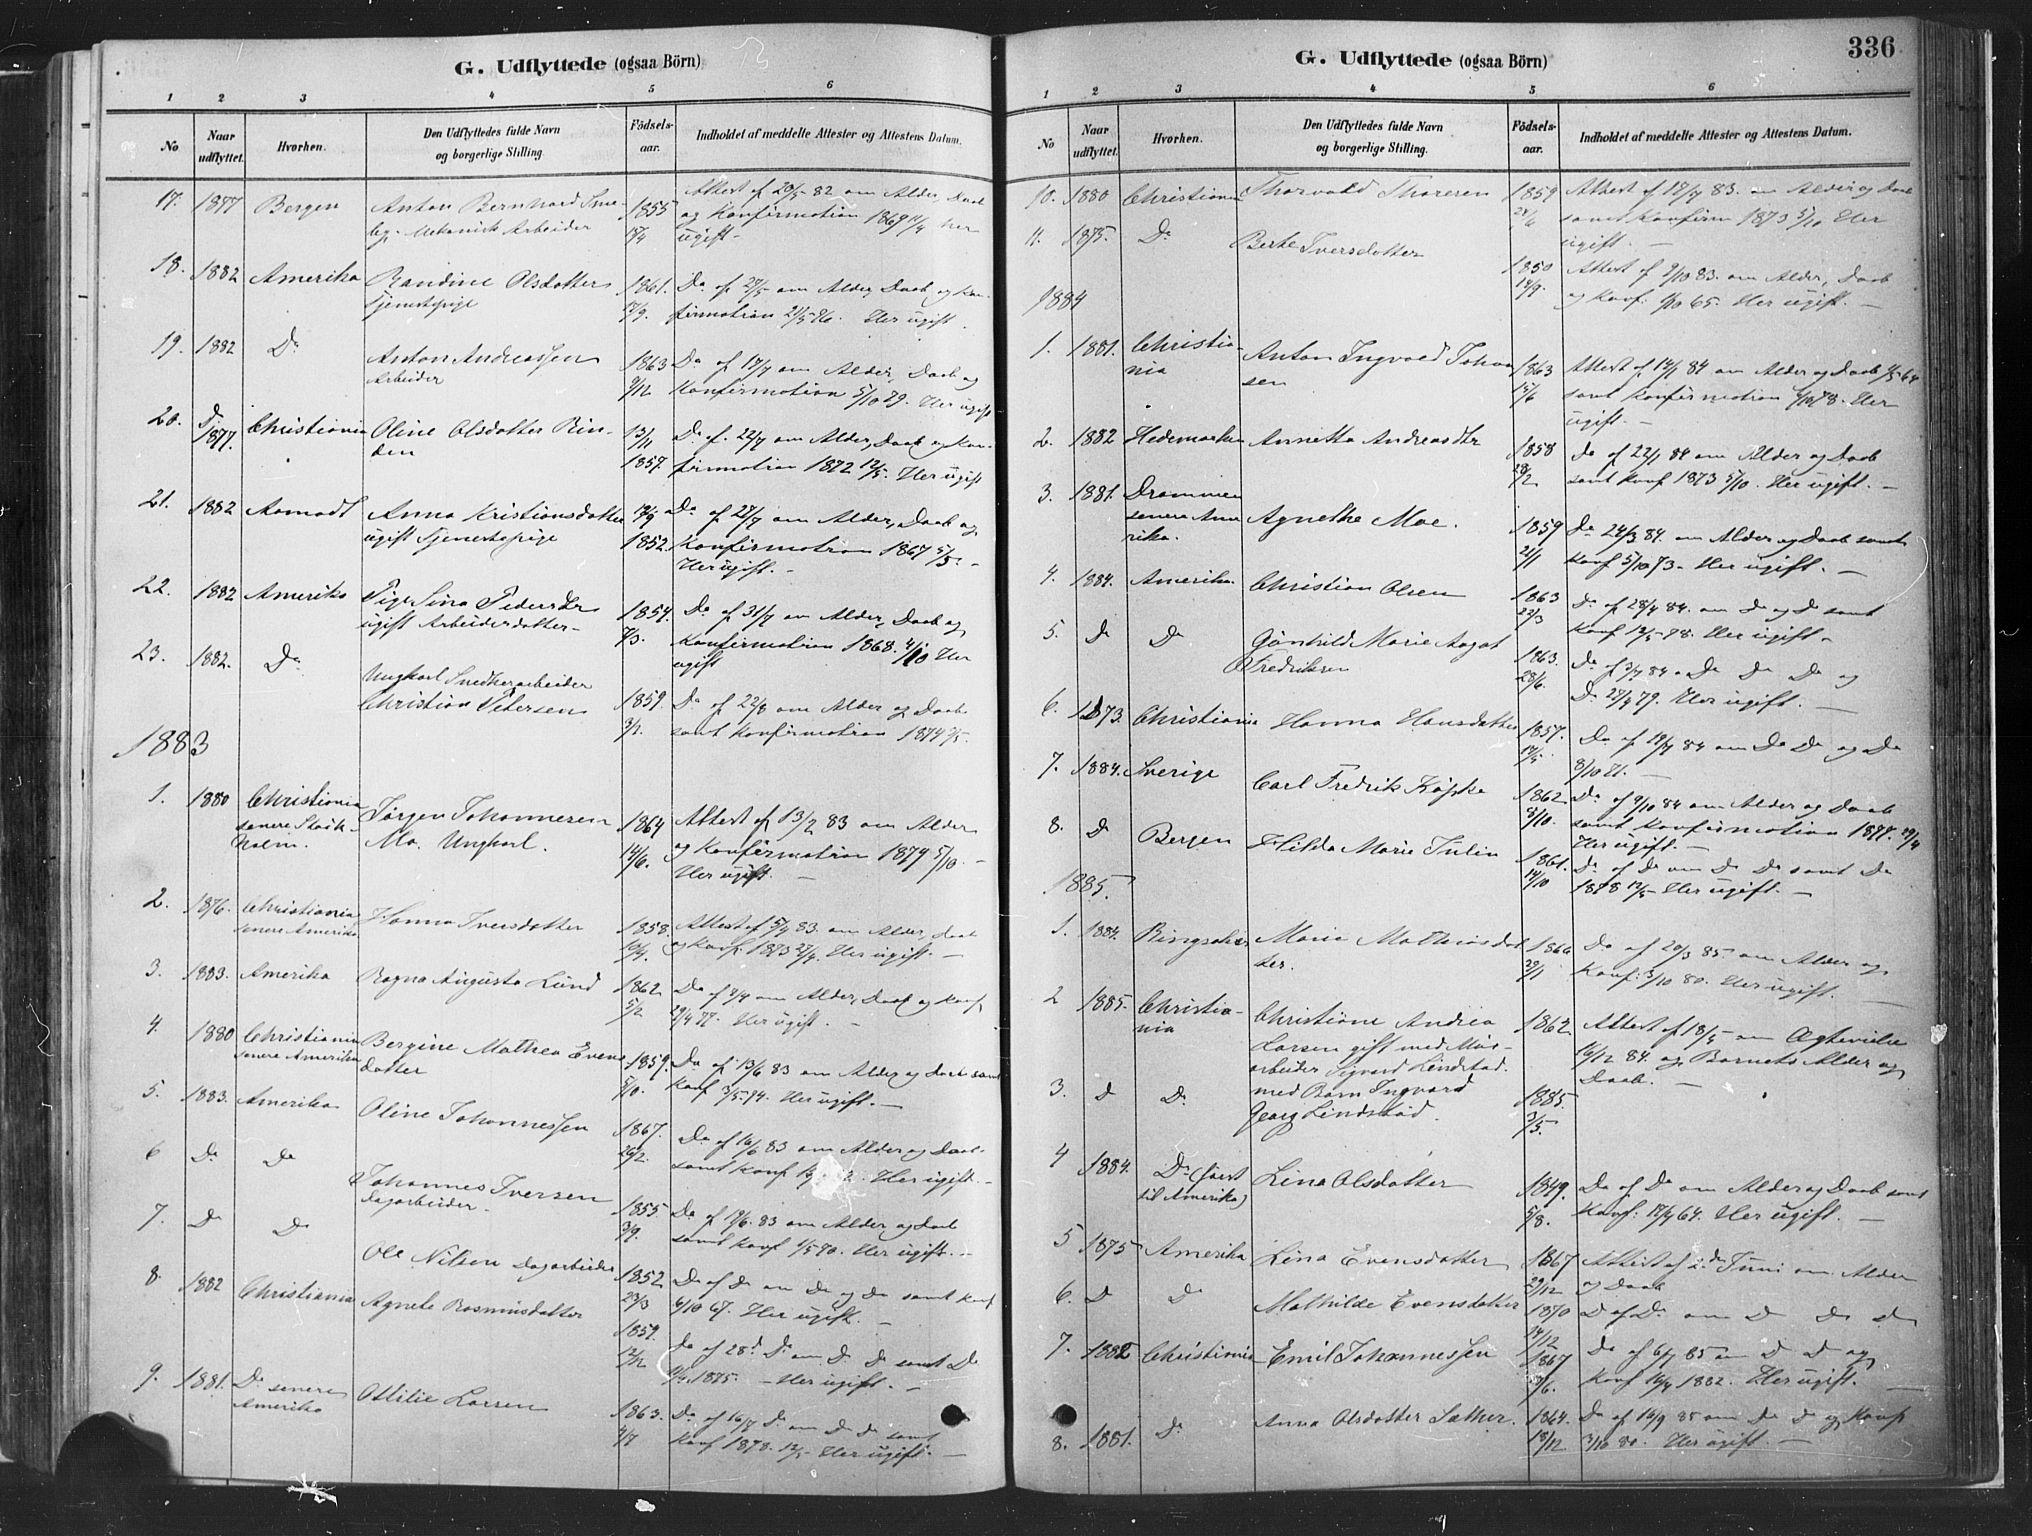 SAH, Fåberg prestekontor, H/Ha/Haa/L0010: Parish register (official) no. 10, 1879-1900, p. 336